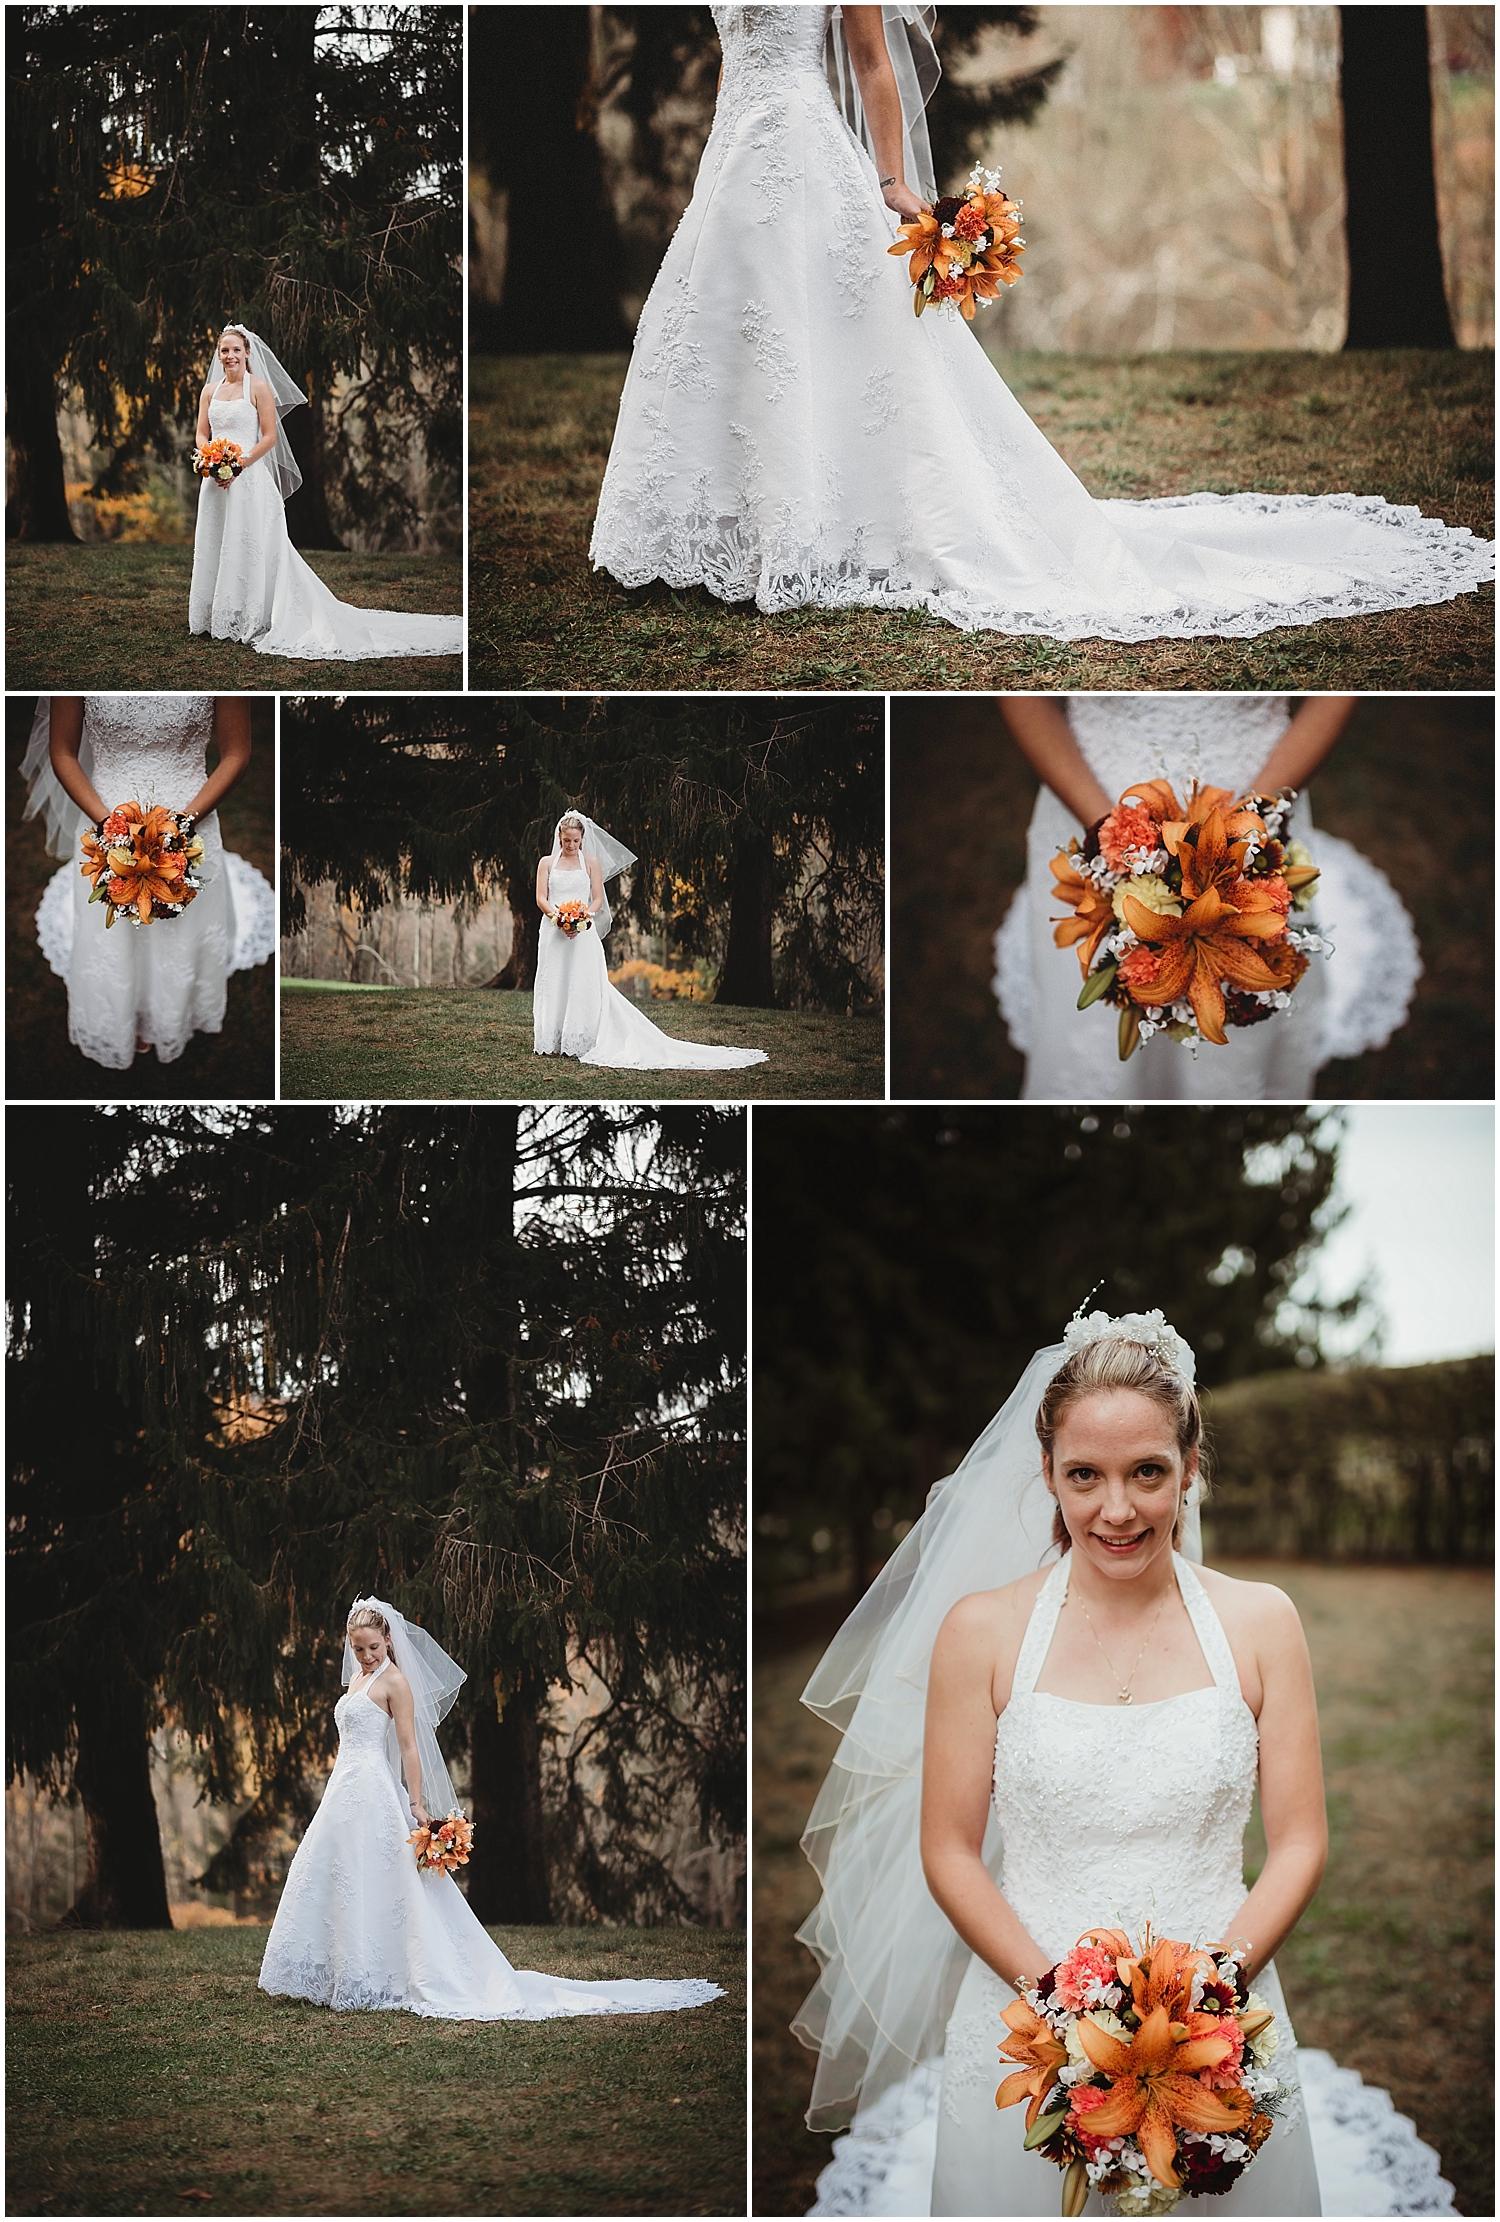 NEPA-Scranton-Dallas-wedding-engagement-photographer-in-Philadelphia-PA-Central-PA_0091.jpg